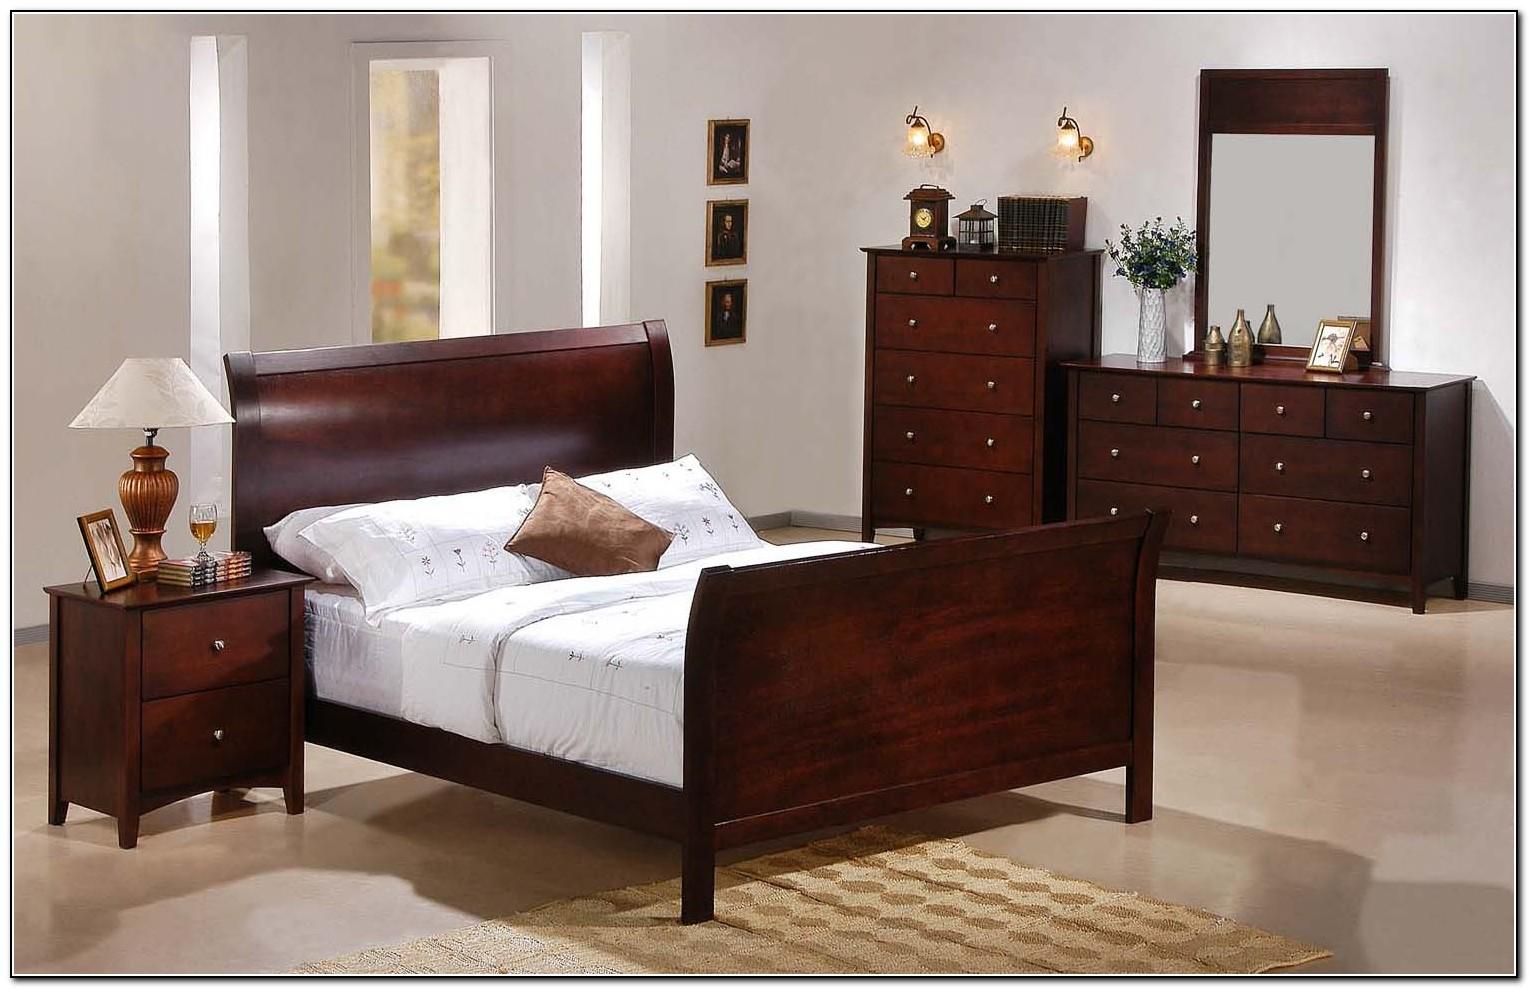 King Sleigh Bed Leather Headboard